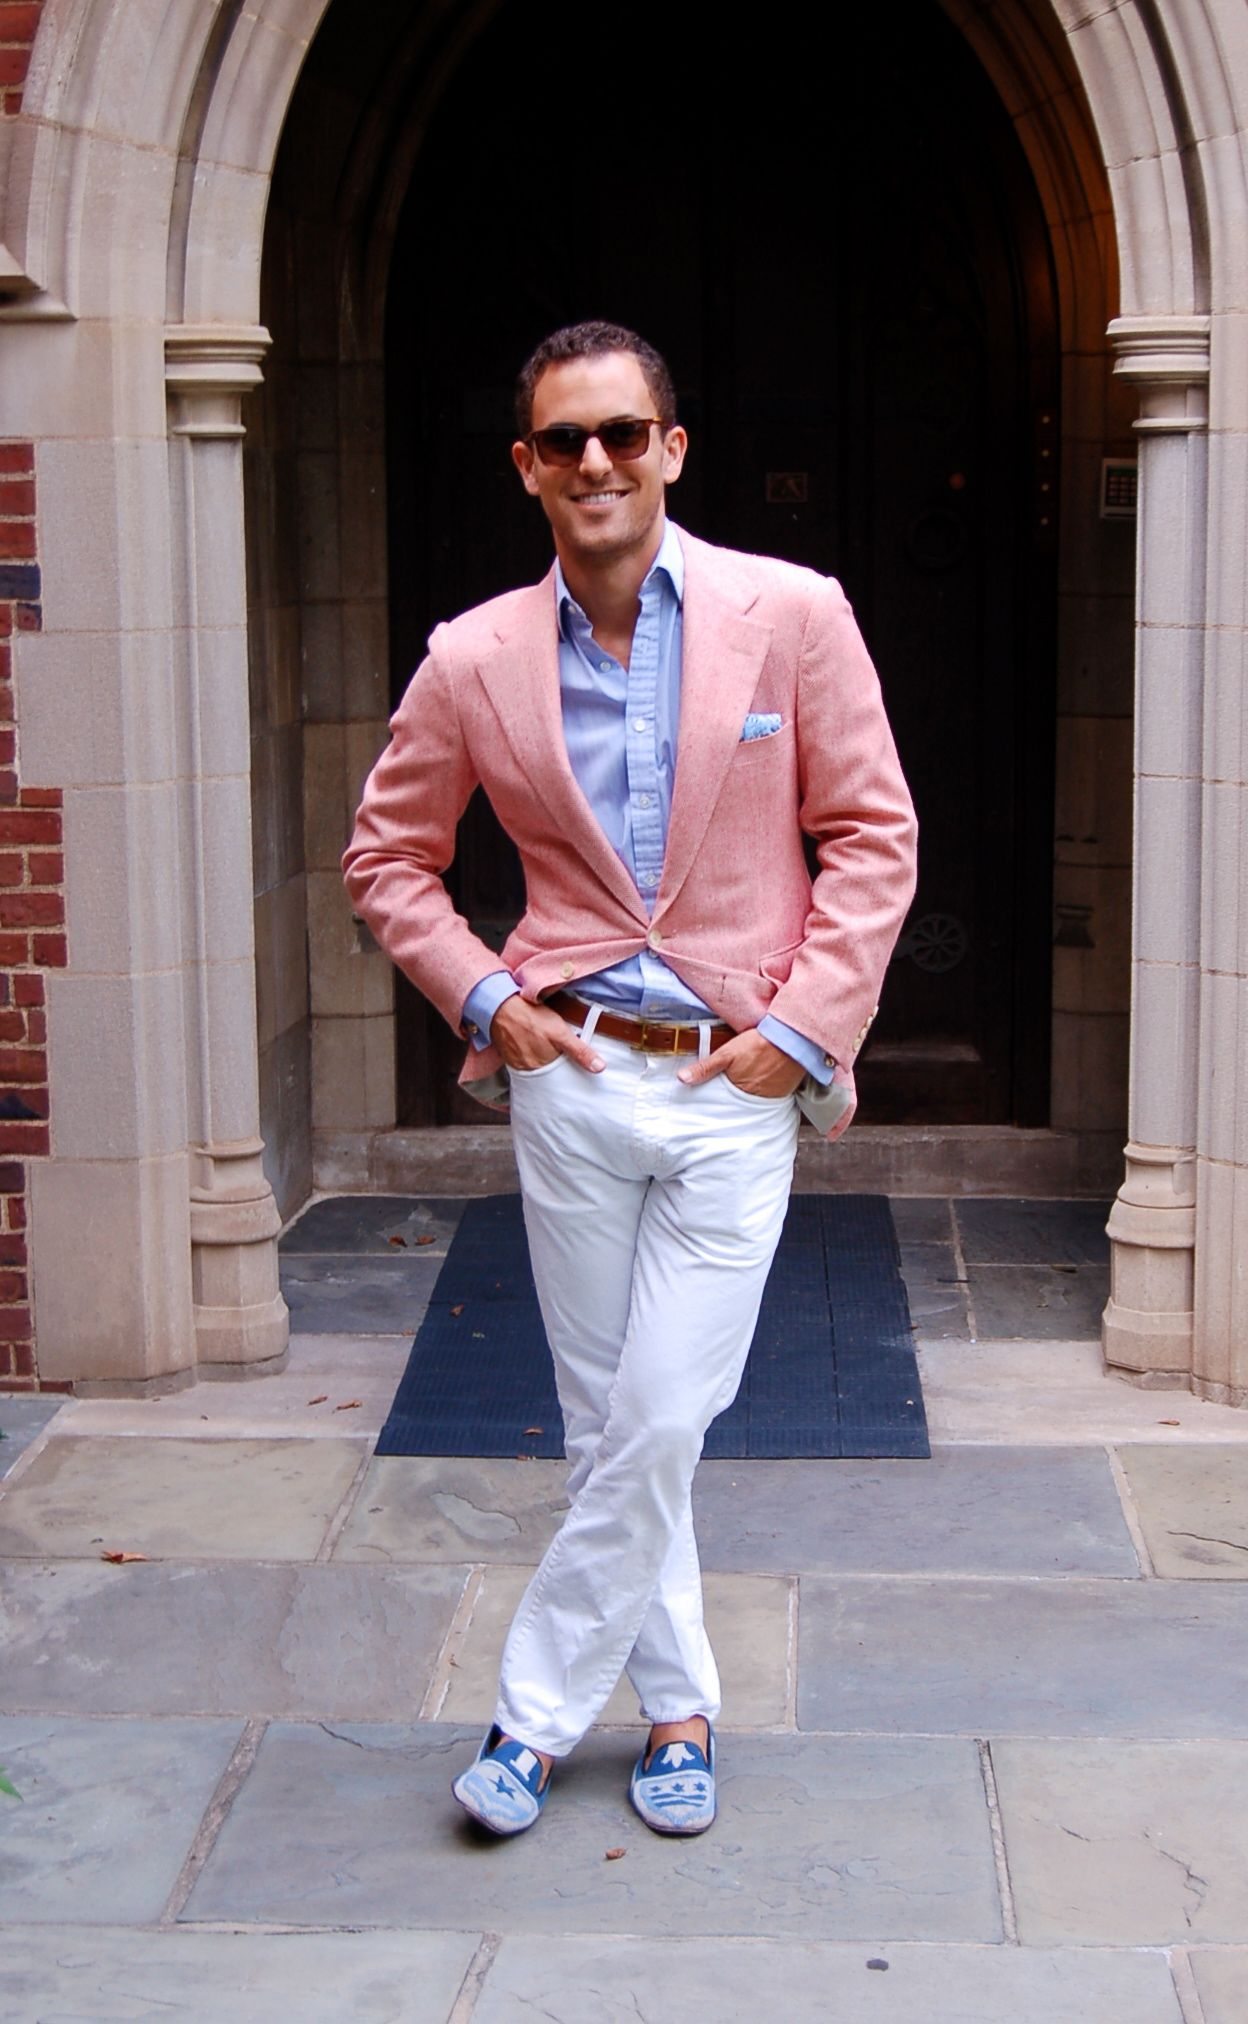 Salmon-colored herringbone blazer | Menu0026#39;s Fashion | Menswear | Menu0026#39;s Outfit for Summer Weddings ...